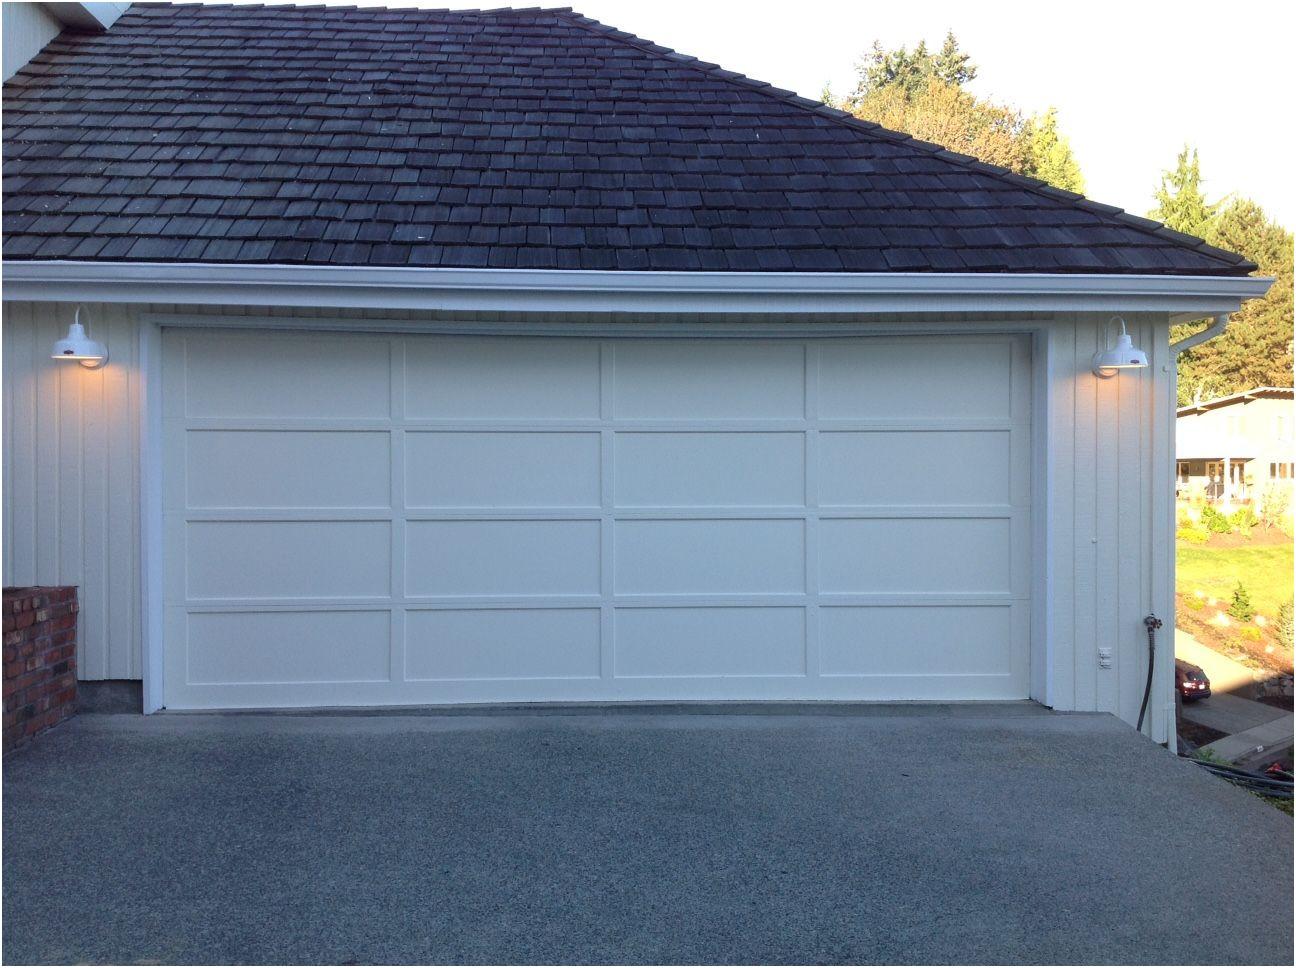 Machine Shed Garage Doors Elegant the original™ Wall Sconce Garage